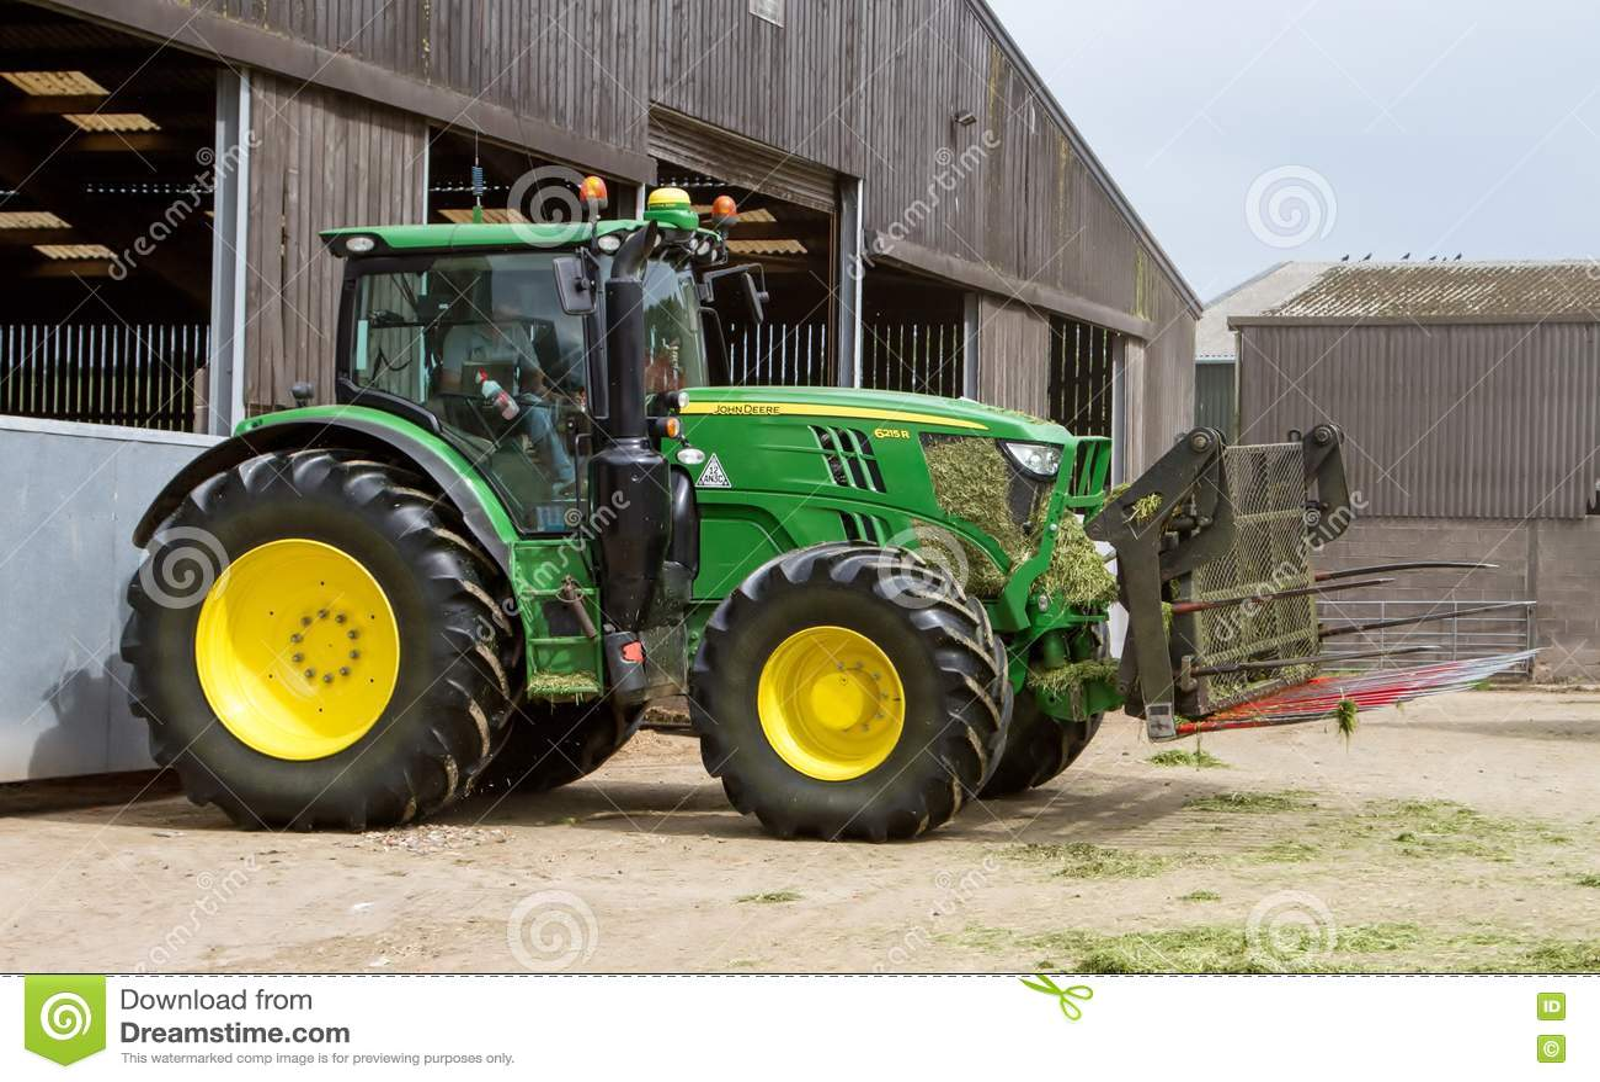 John Deere Traktor Der Silage An Der Klammer Drückt Redaktionelles